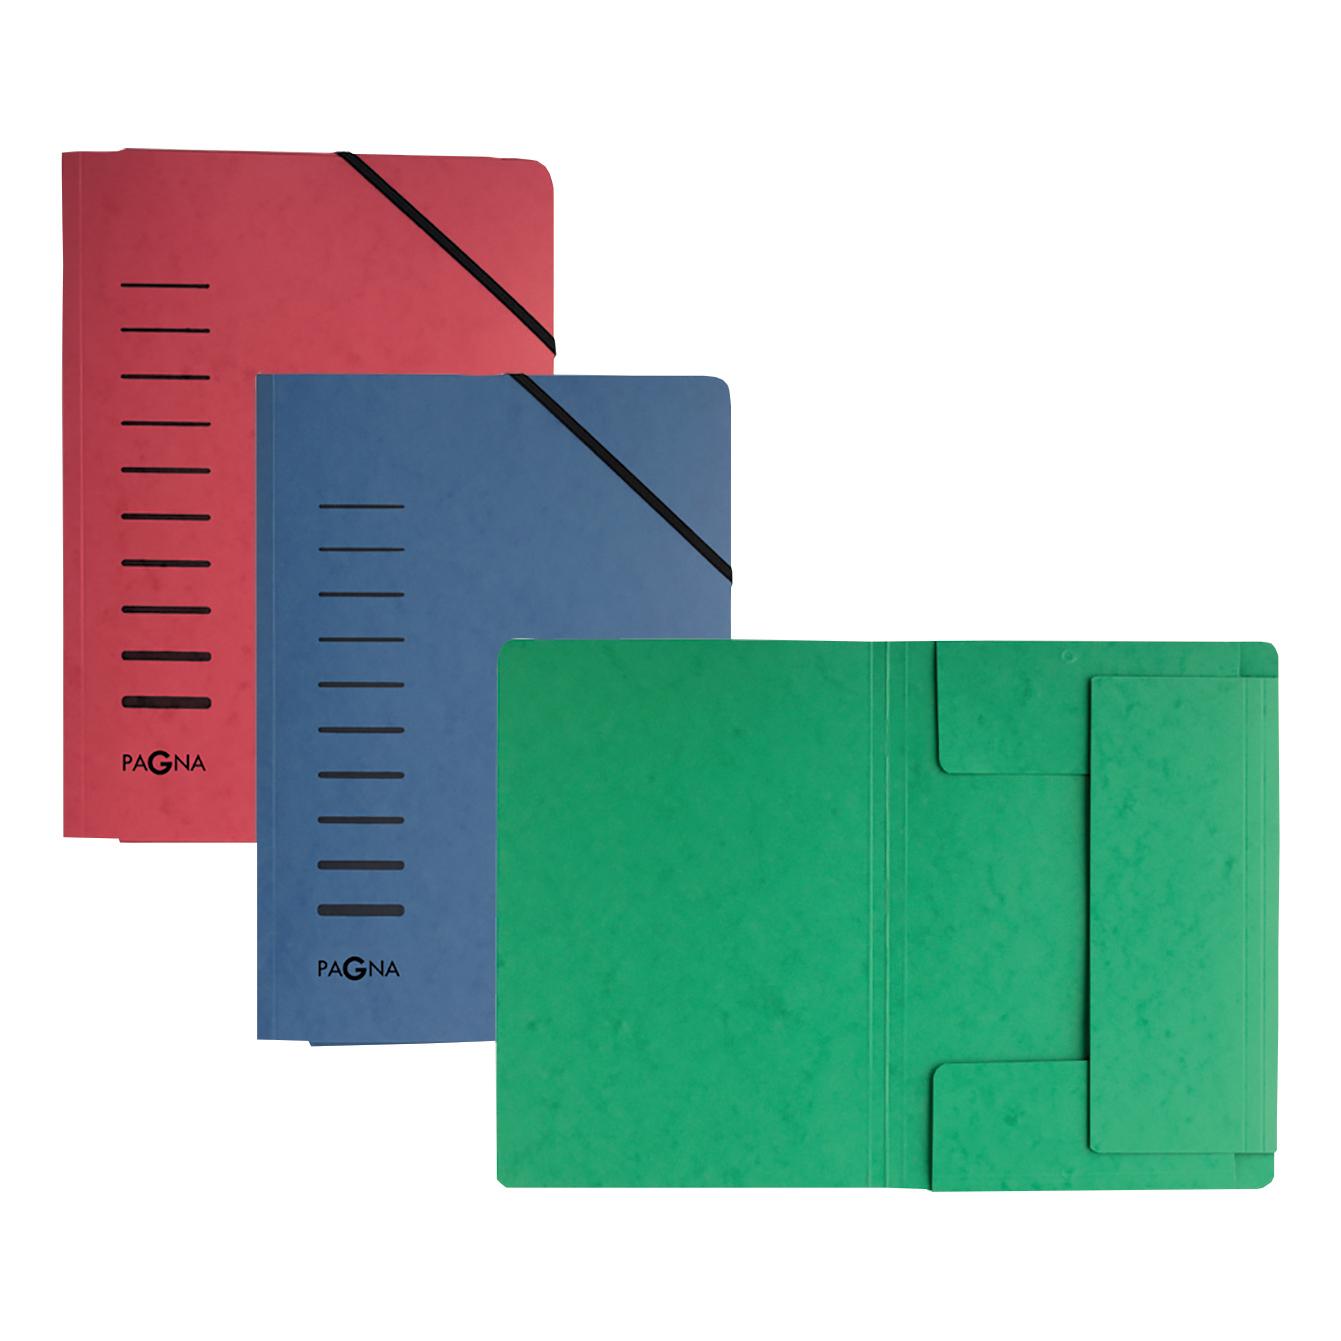 Pagna Classic Folder Elastic Corner Straps Pressboard A4 Red Ref 2400701 Pack 25